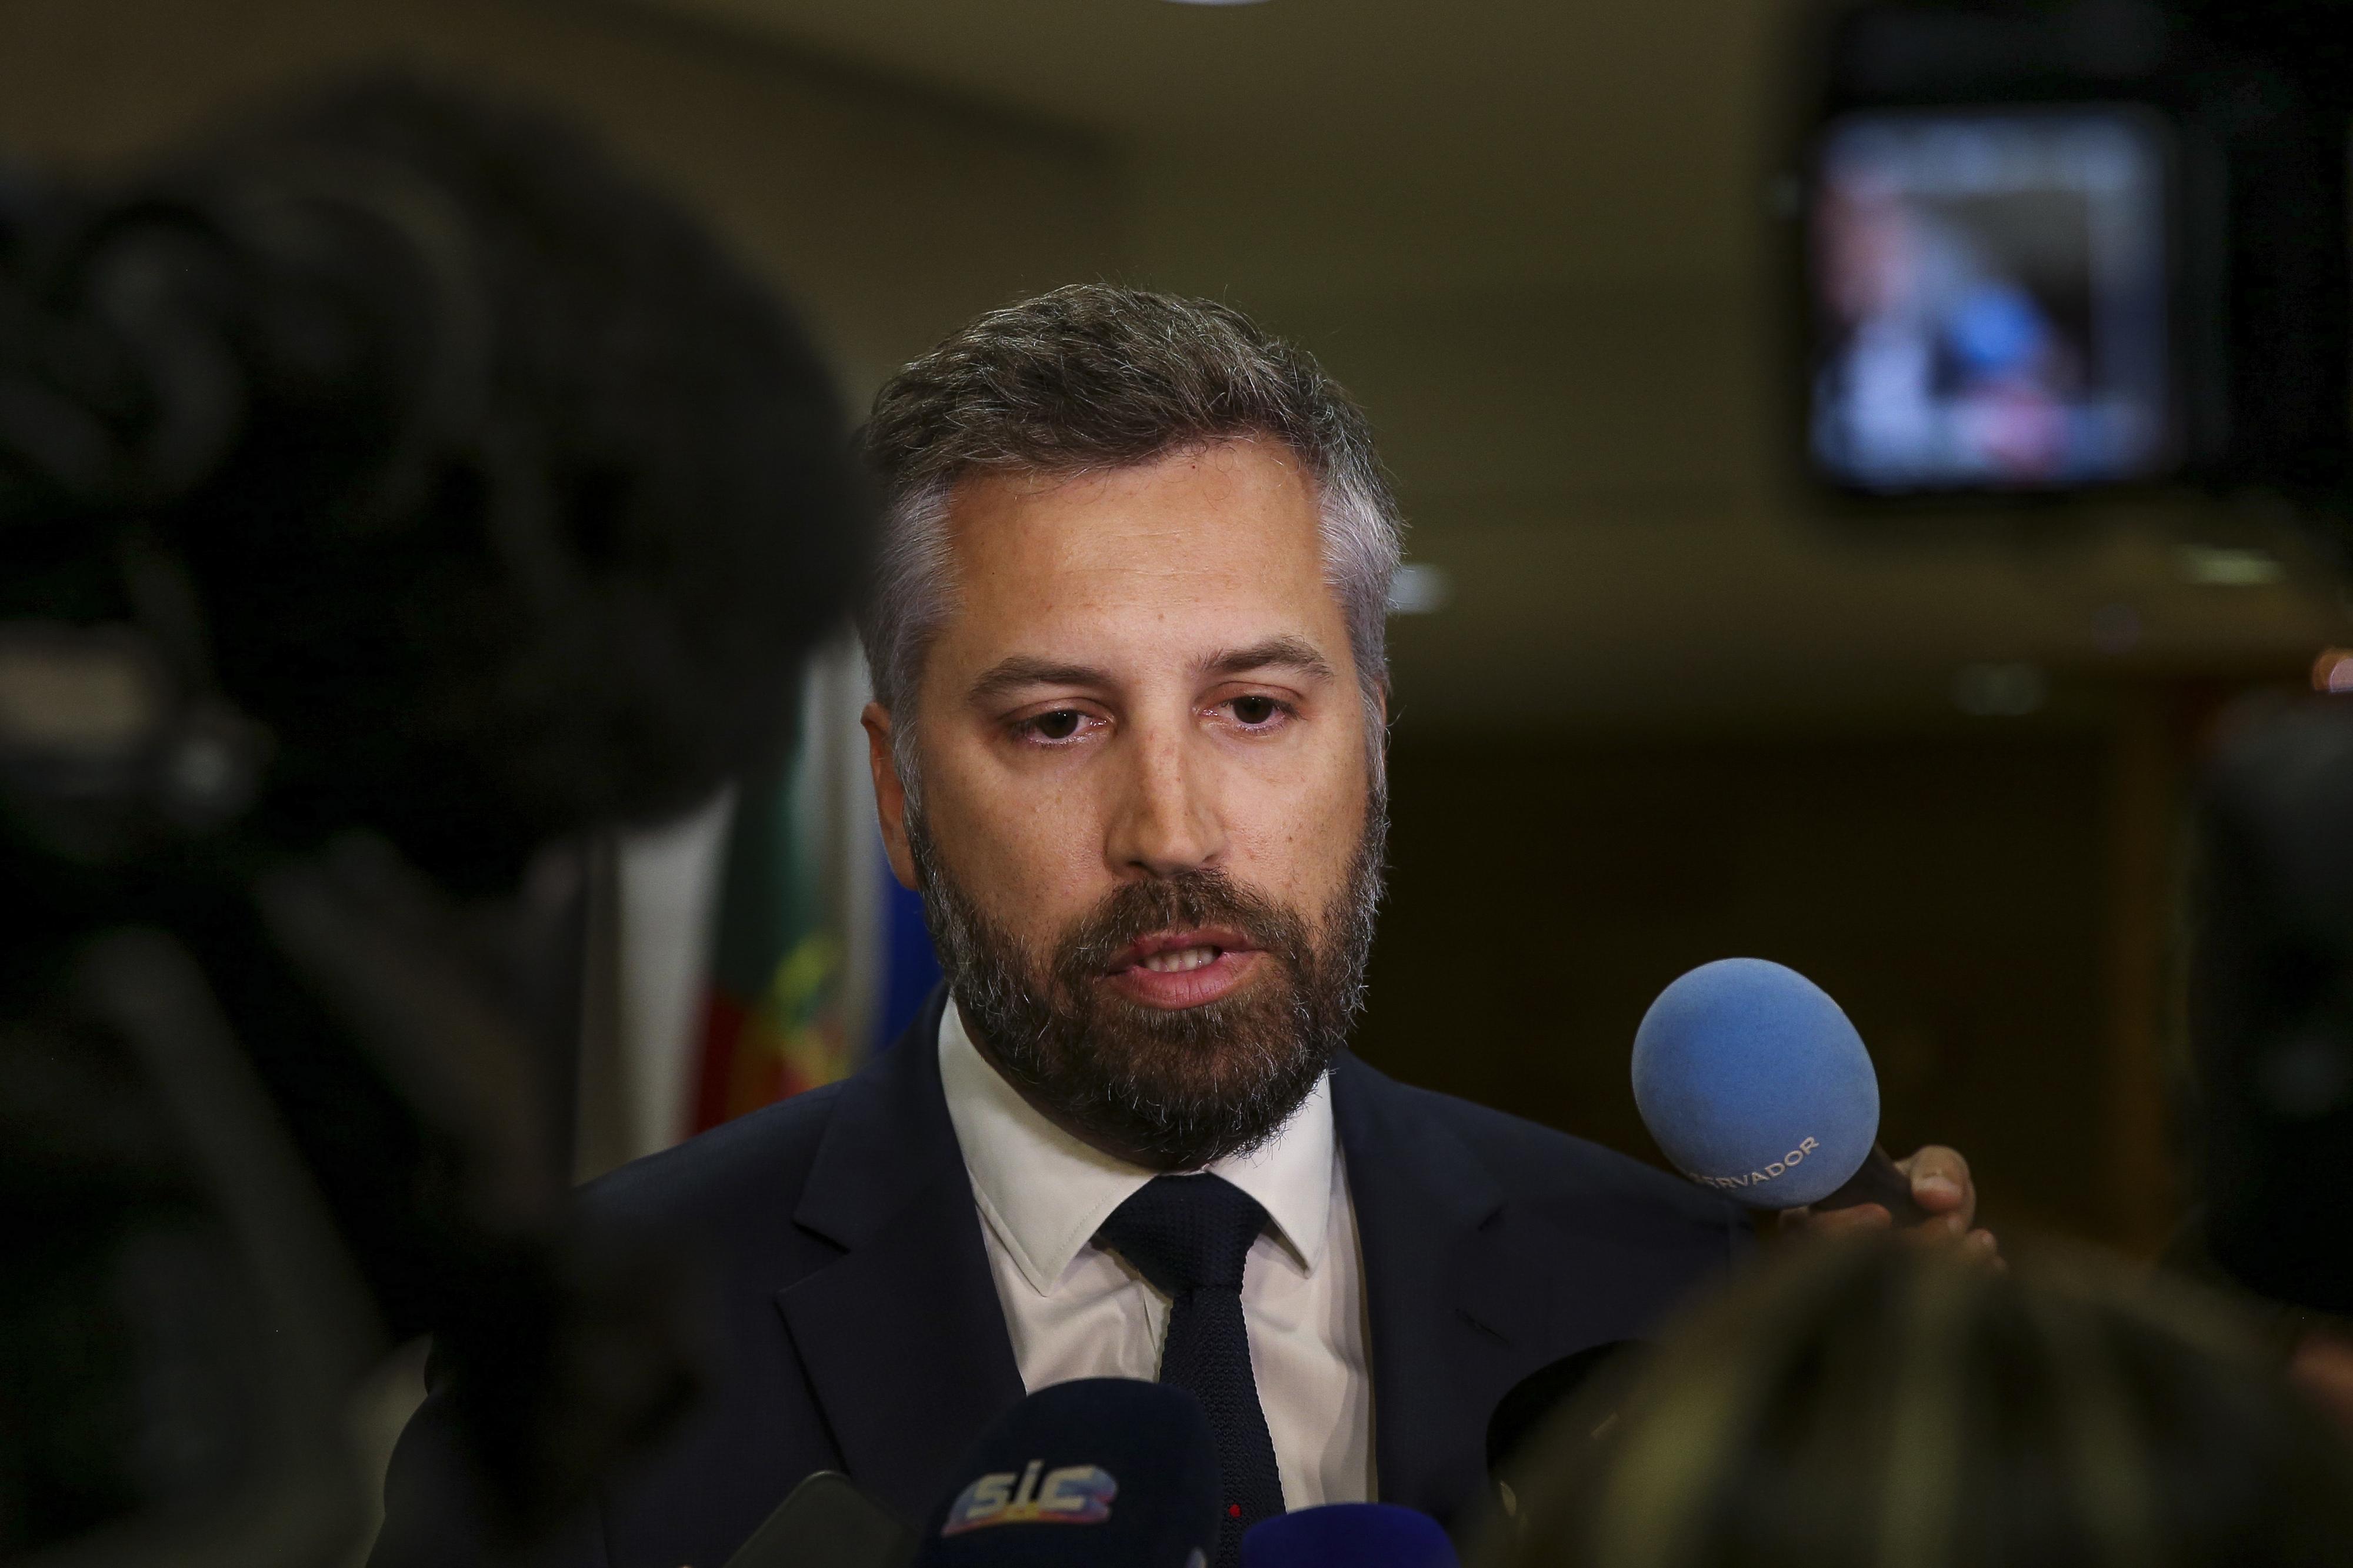 """Ninguém está a fugir a nada"", diz ministro sobre impacto ambiental de obras no aeroporto de Lisboa"